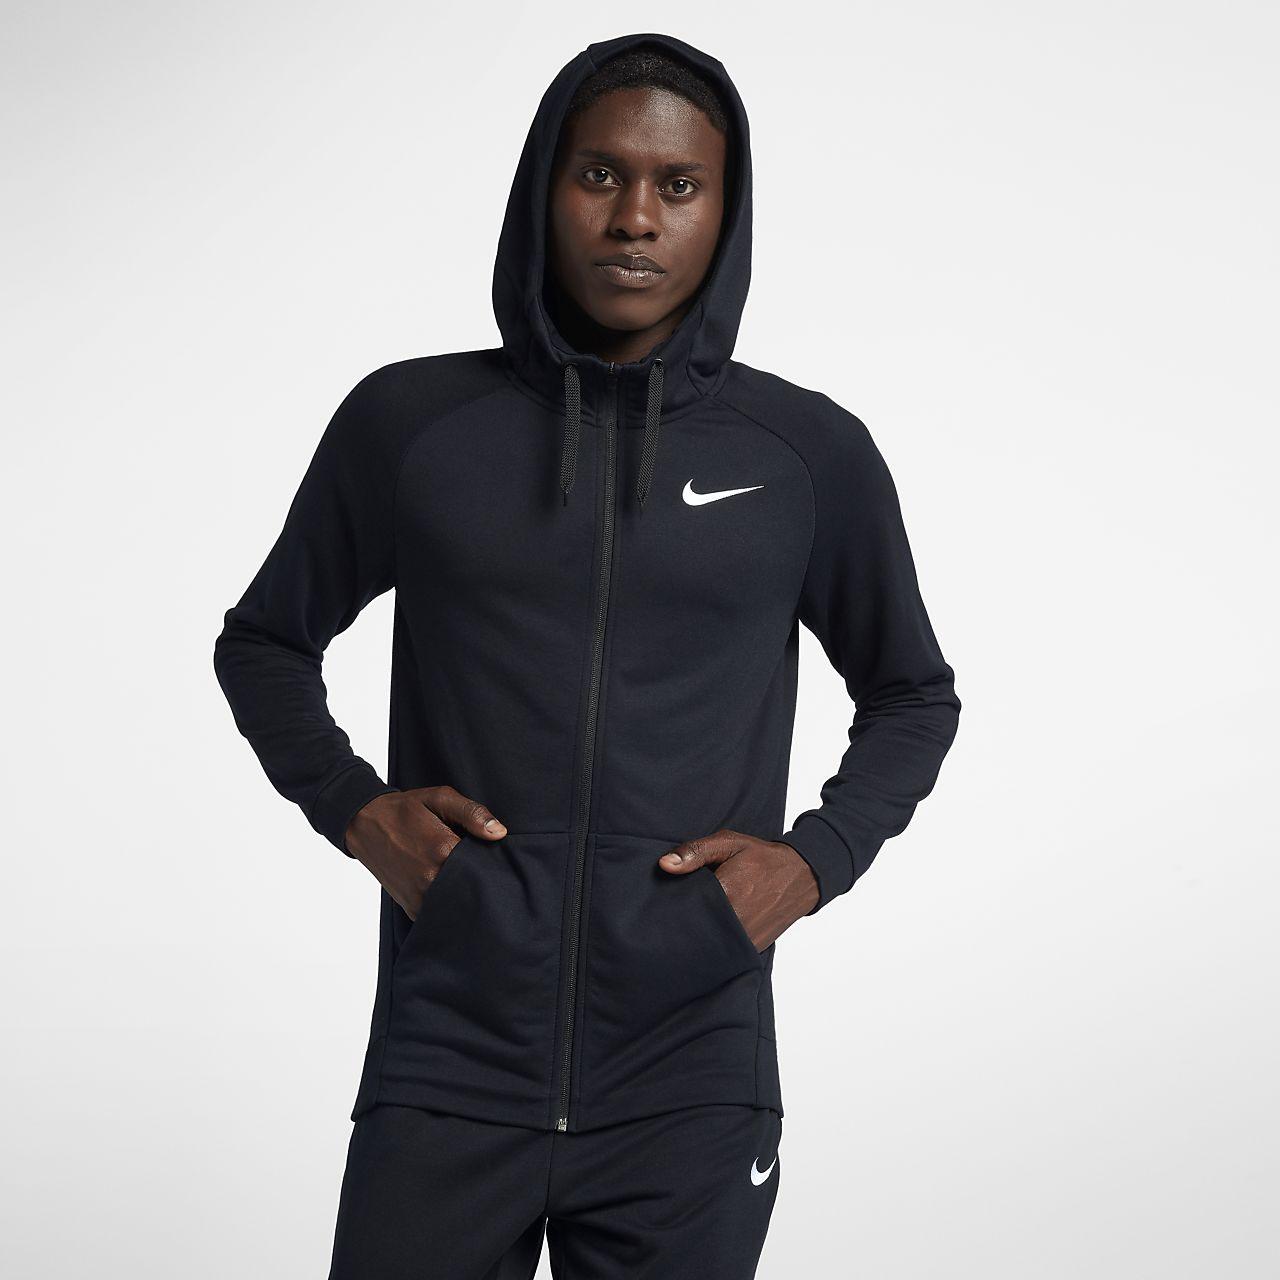 dc2fe2eb02b2 Nike Dri-FIT Men s Full-Zip Training Hoodie. Nike.com NL